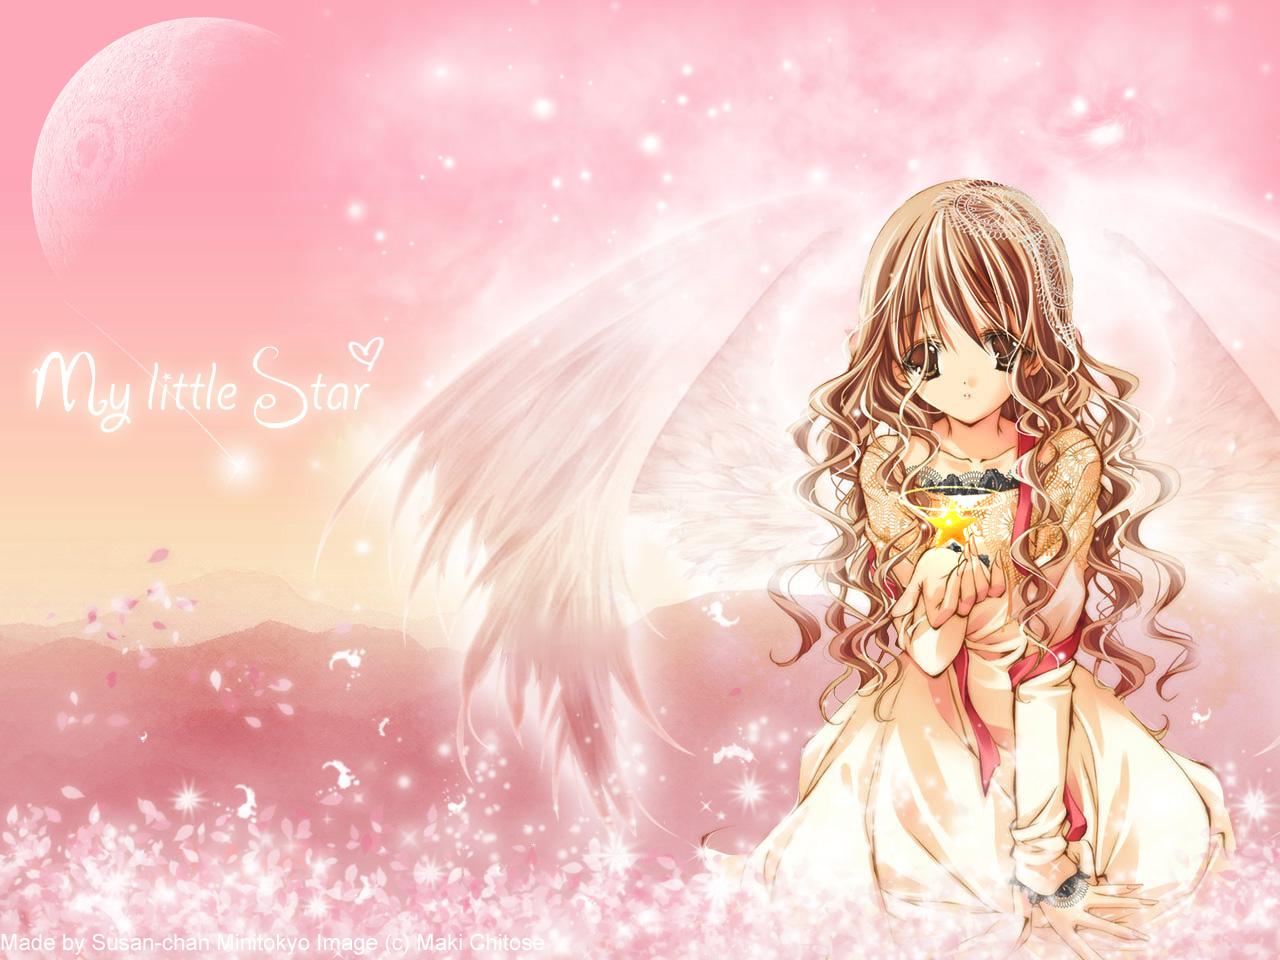 strawberry_panic wings